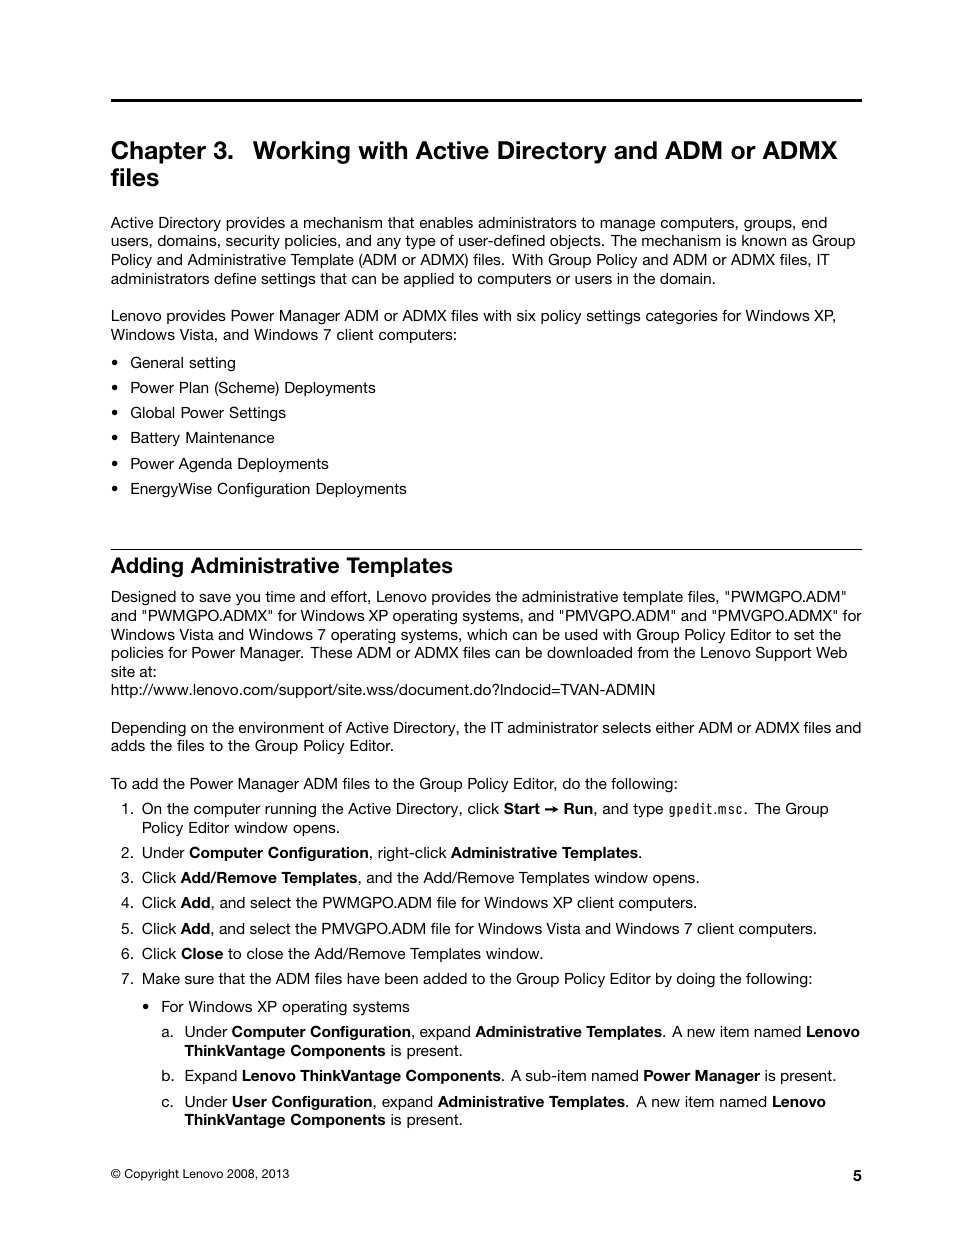 Adding administrative templates | Lenovo ThinkVantage (Power